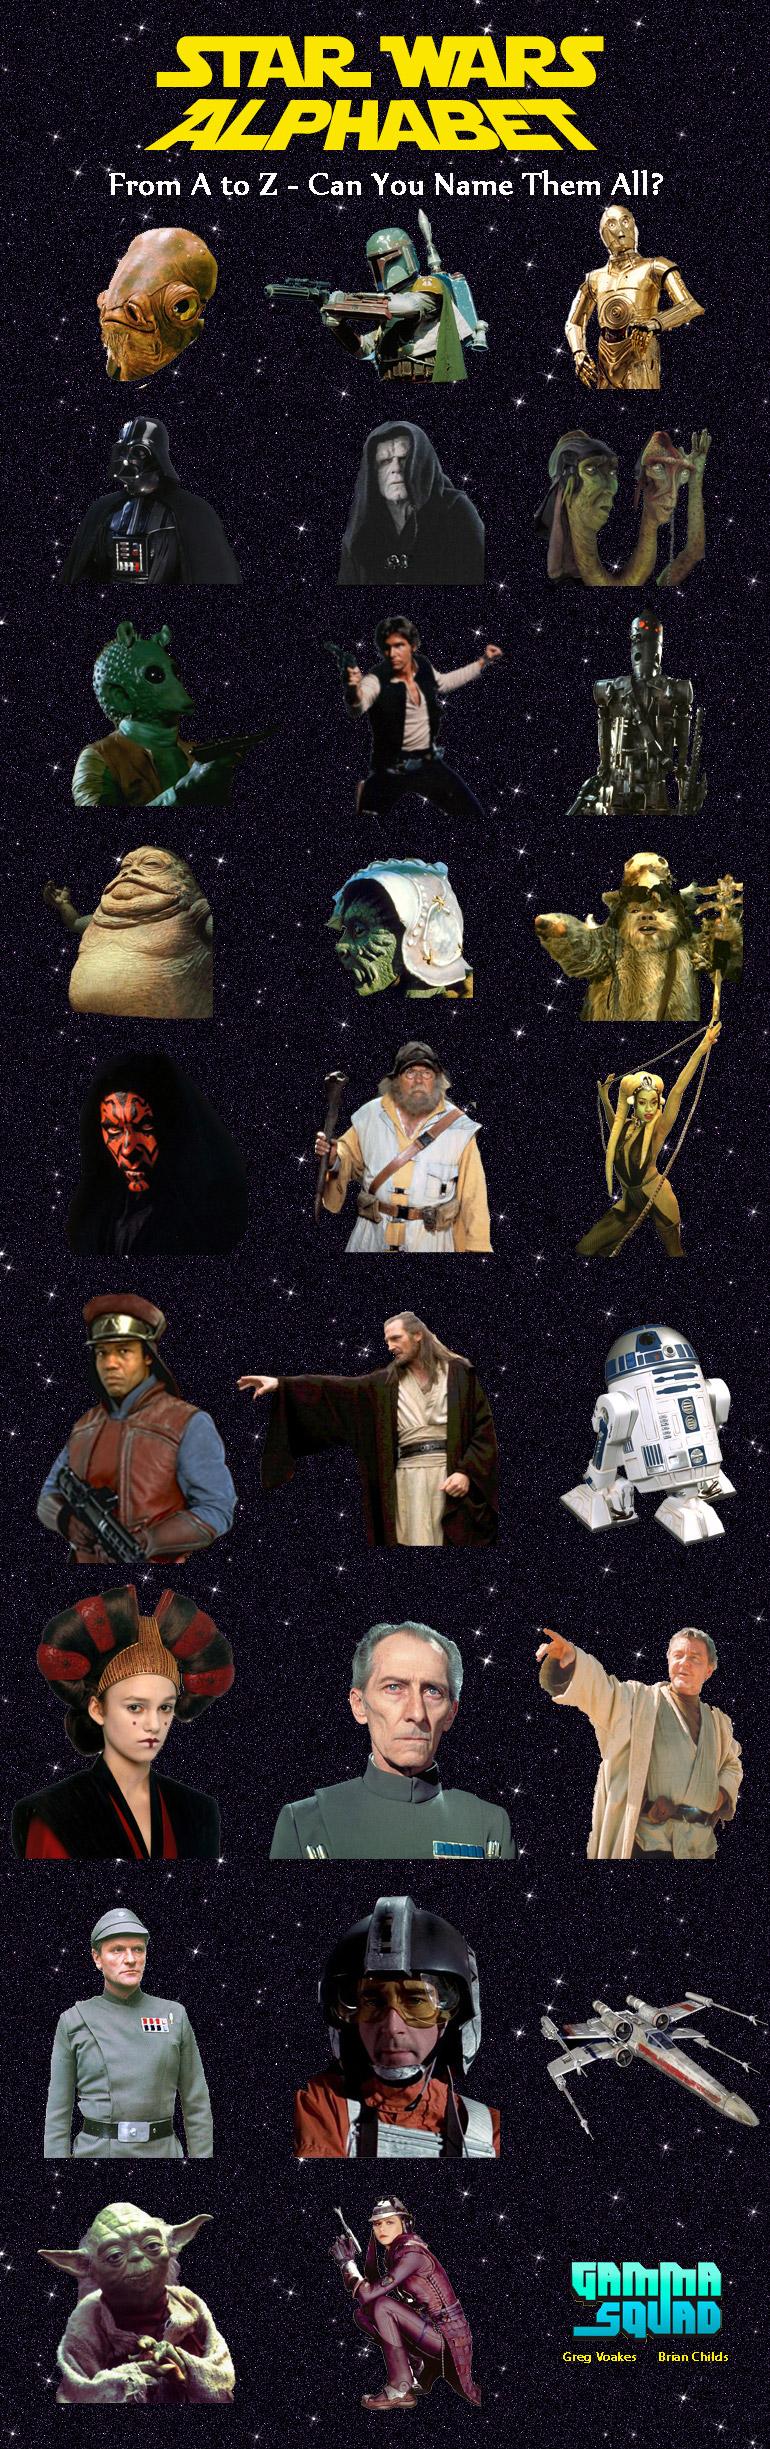 Star Wars Alphabet Game [Gotta Get 'Em All!]